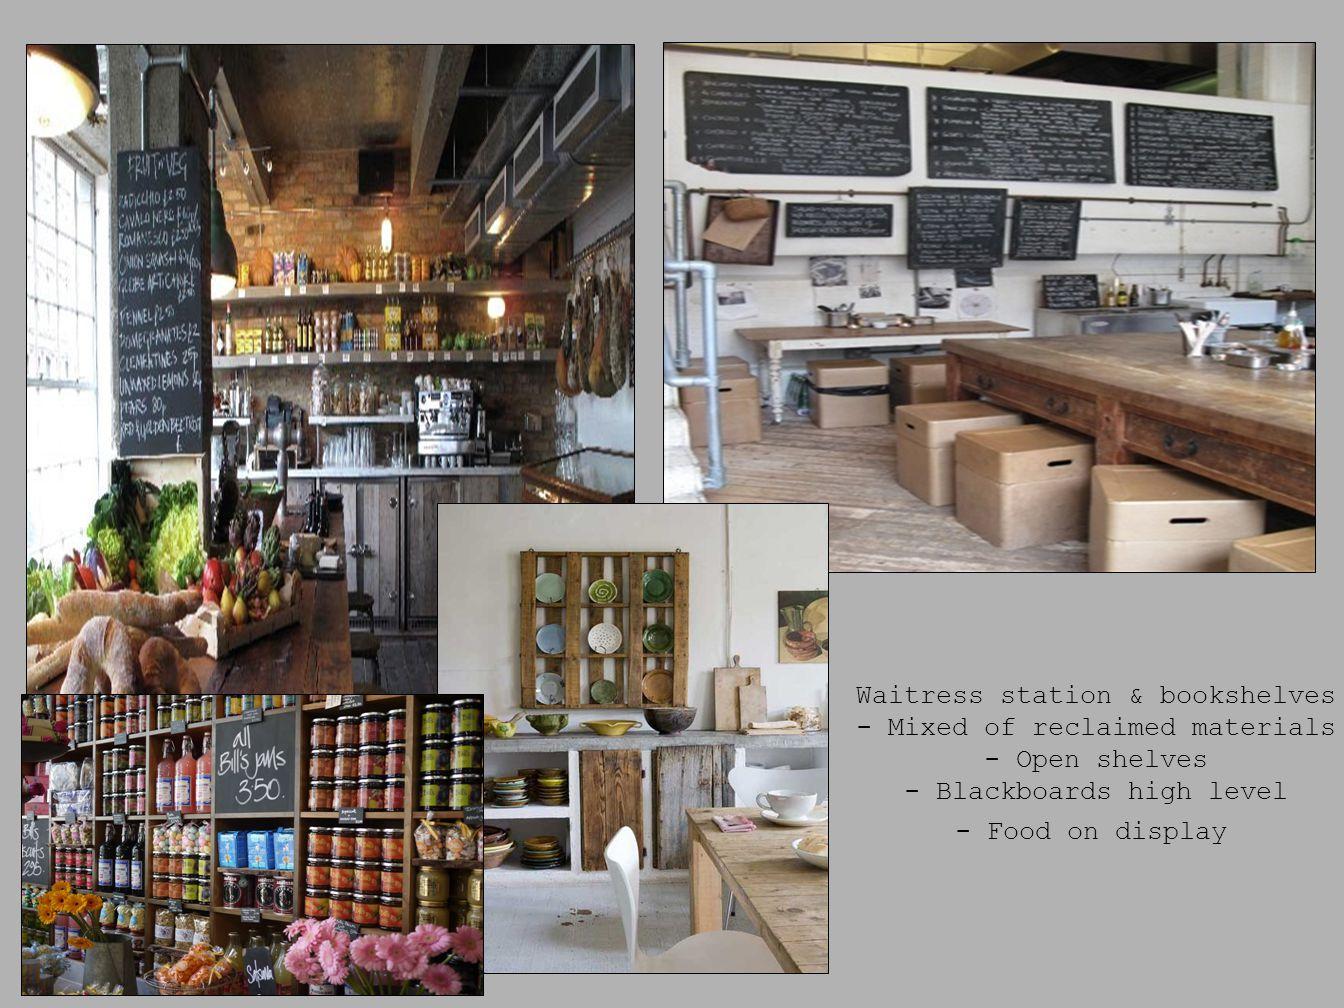 Waitress station & bookshelves - Mixed of reclaimed materials - Open shelves - Blackboards high level - Food on display